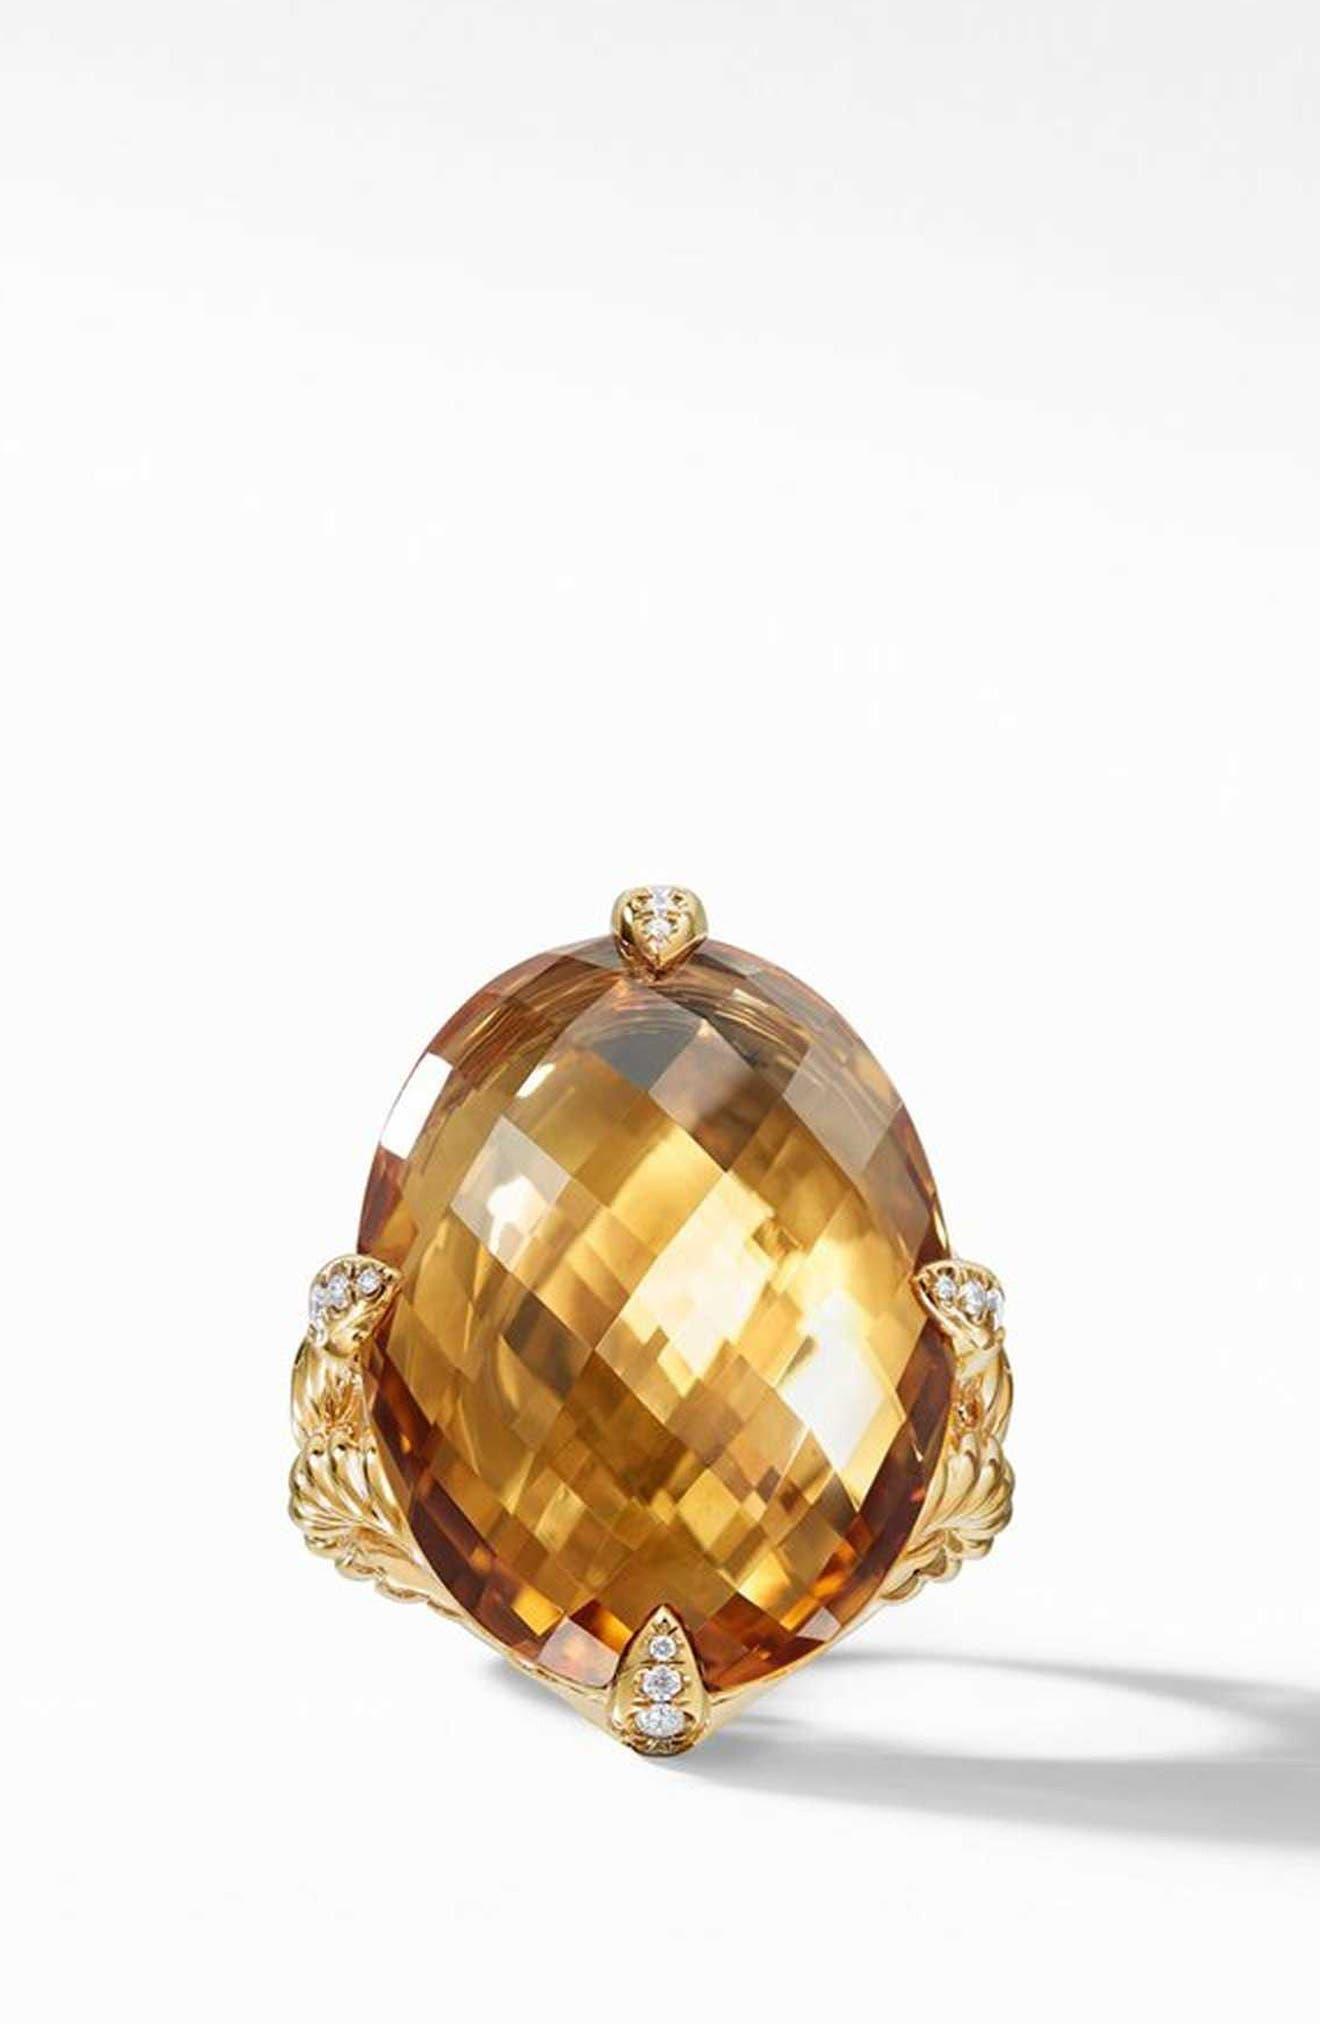 Chatelaine<sup>®</sup> 18k Gold Statement Ring with Honey Quartz & Diamonds,                             Alternate thumbnail 3, color,                             GOLD/ DIAMOND/ HONEY QUARTZ